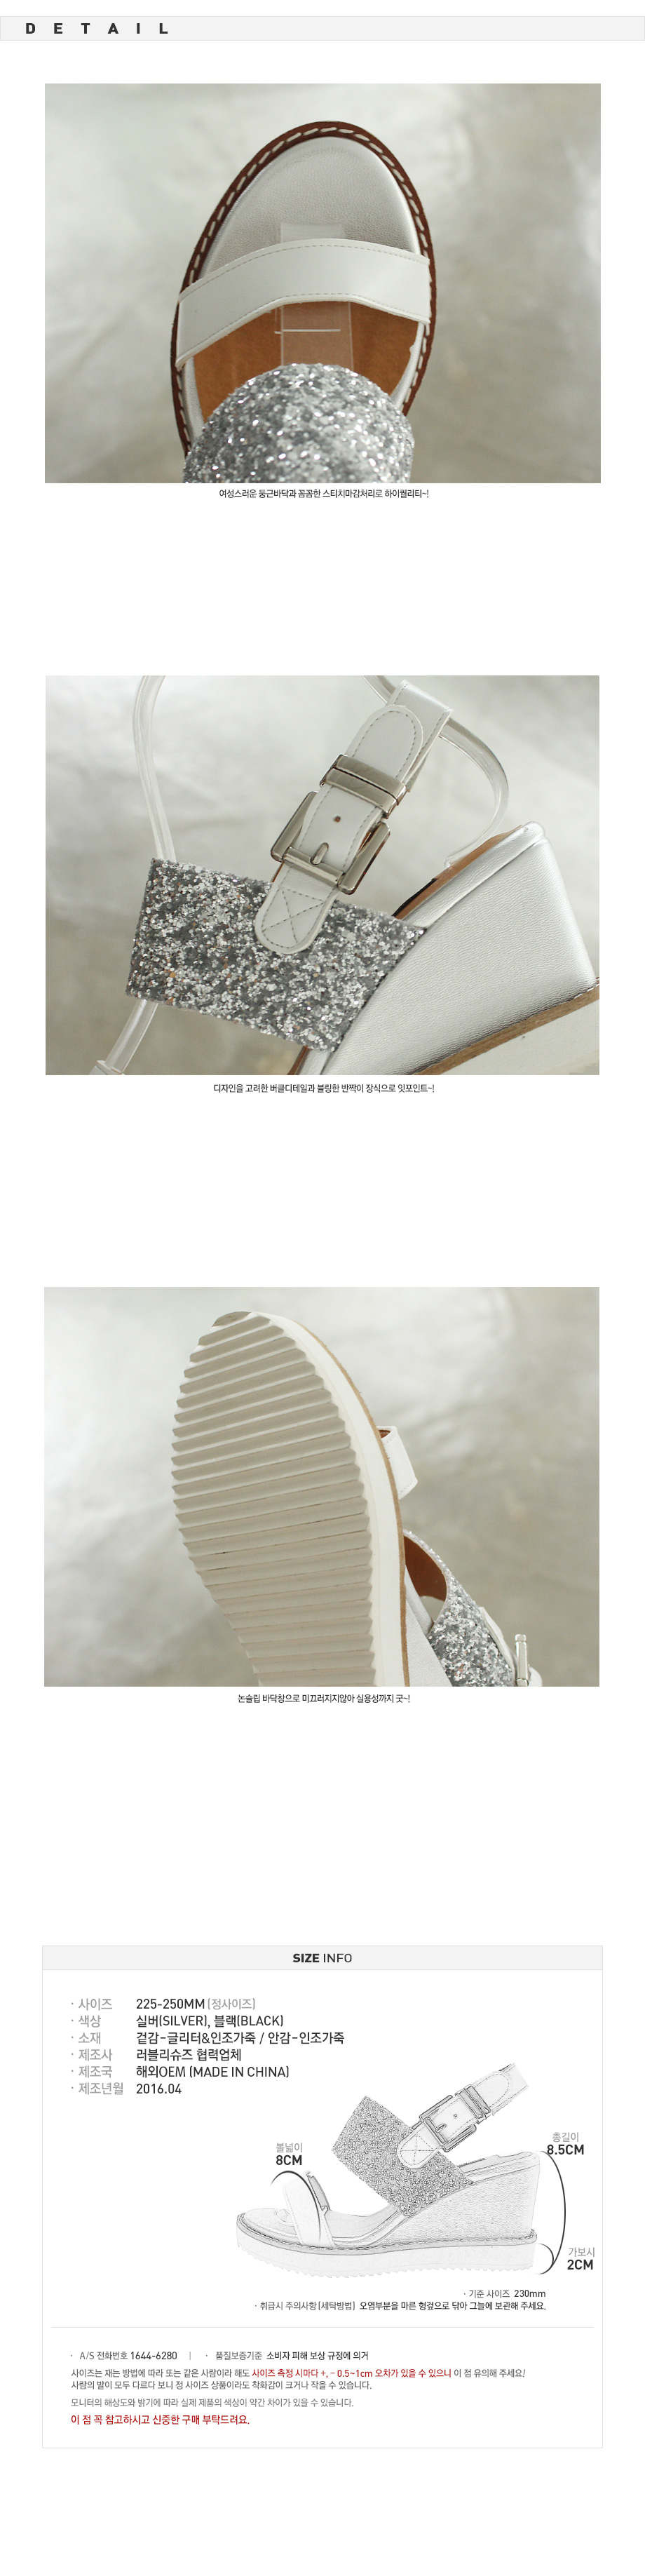 Mocking wedge sandals 8.5cm